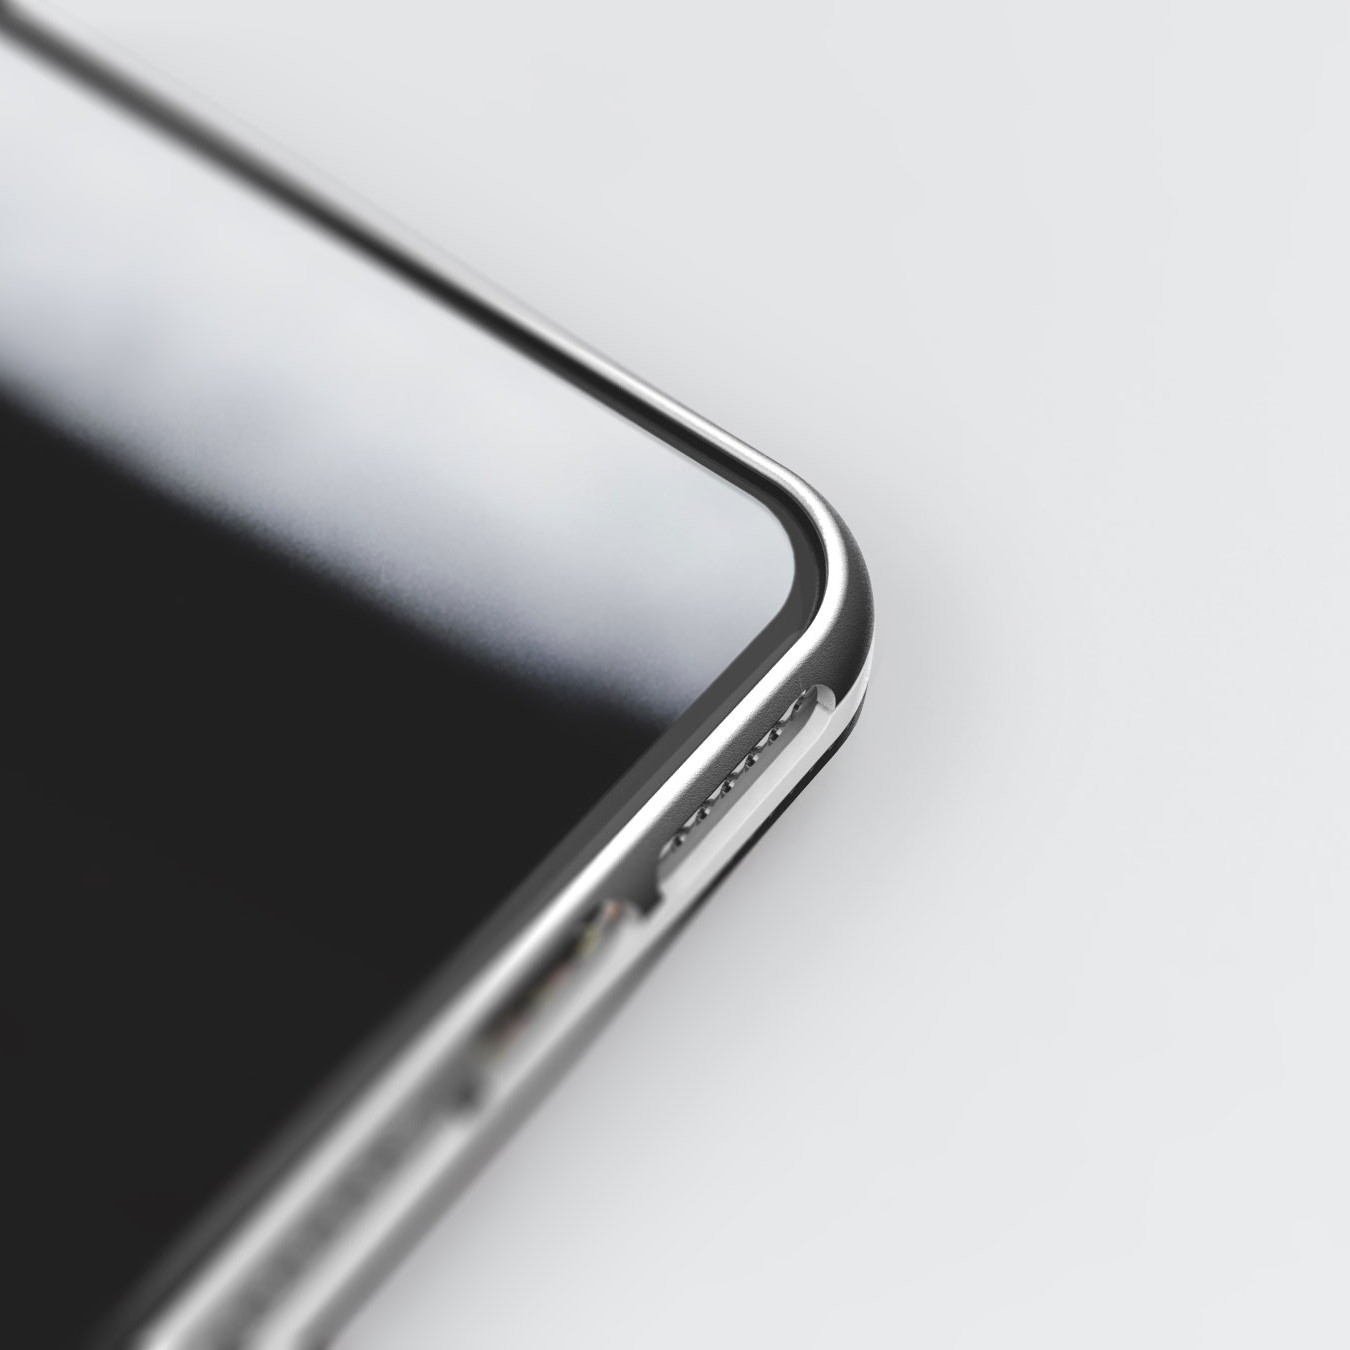 corner-close-up.jpg